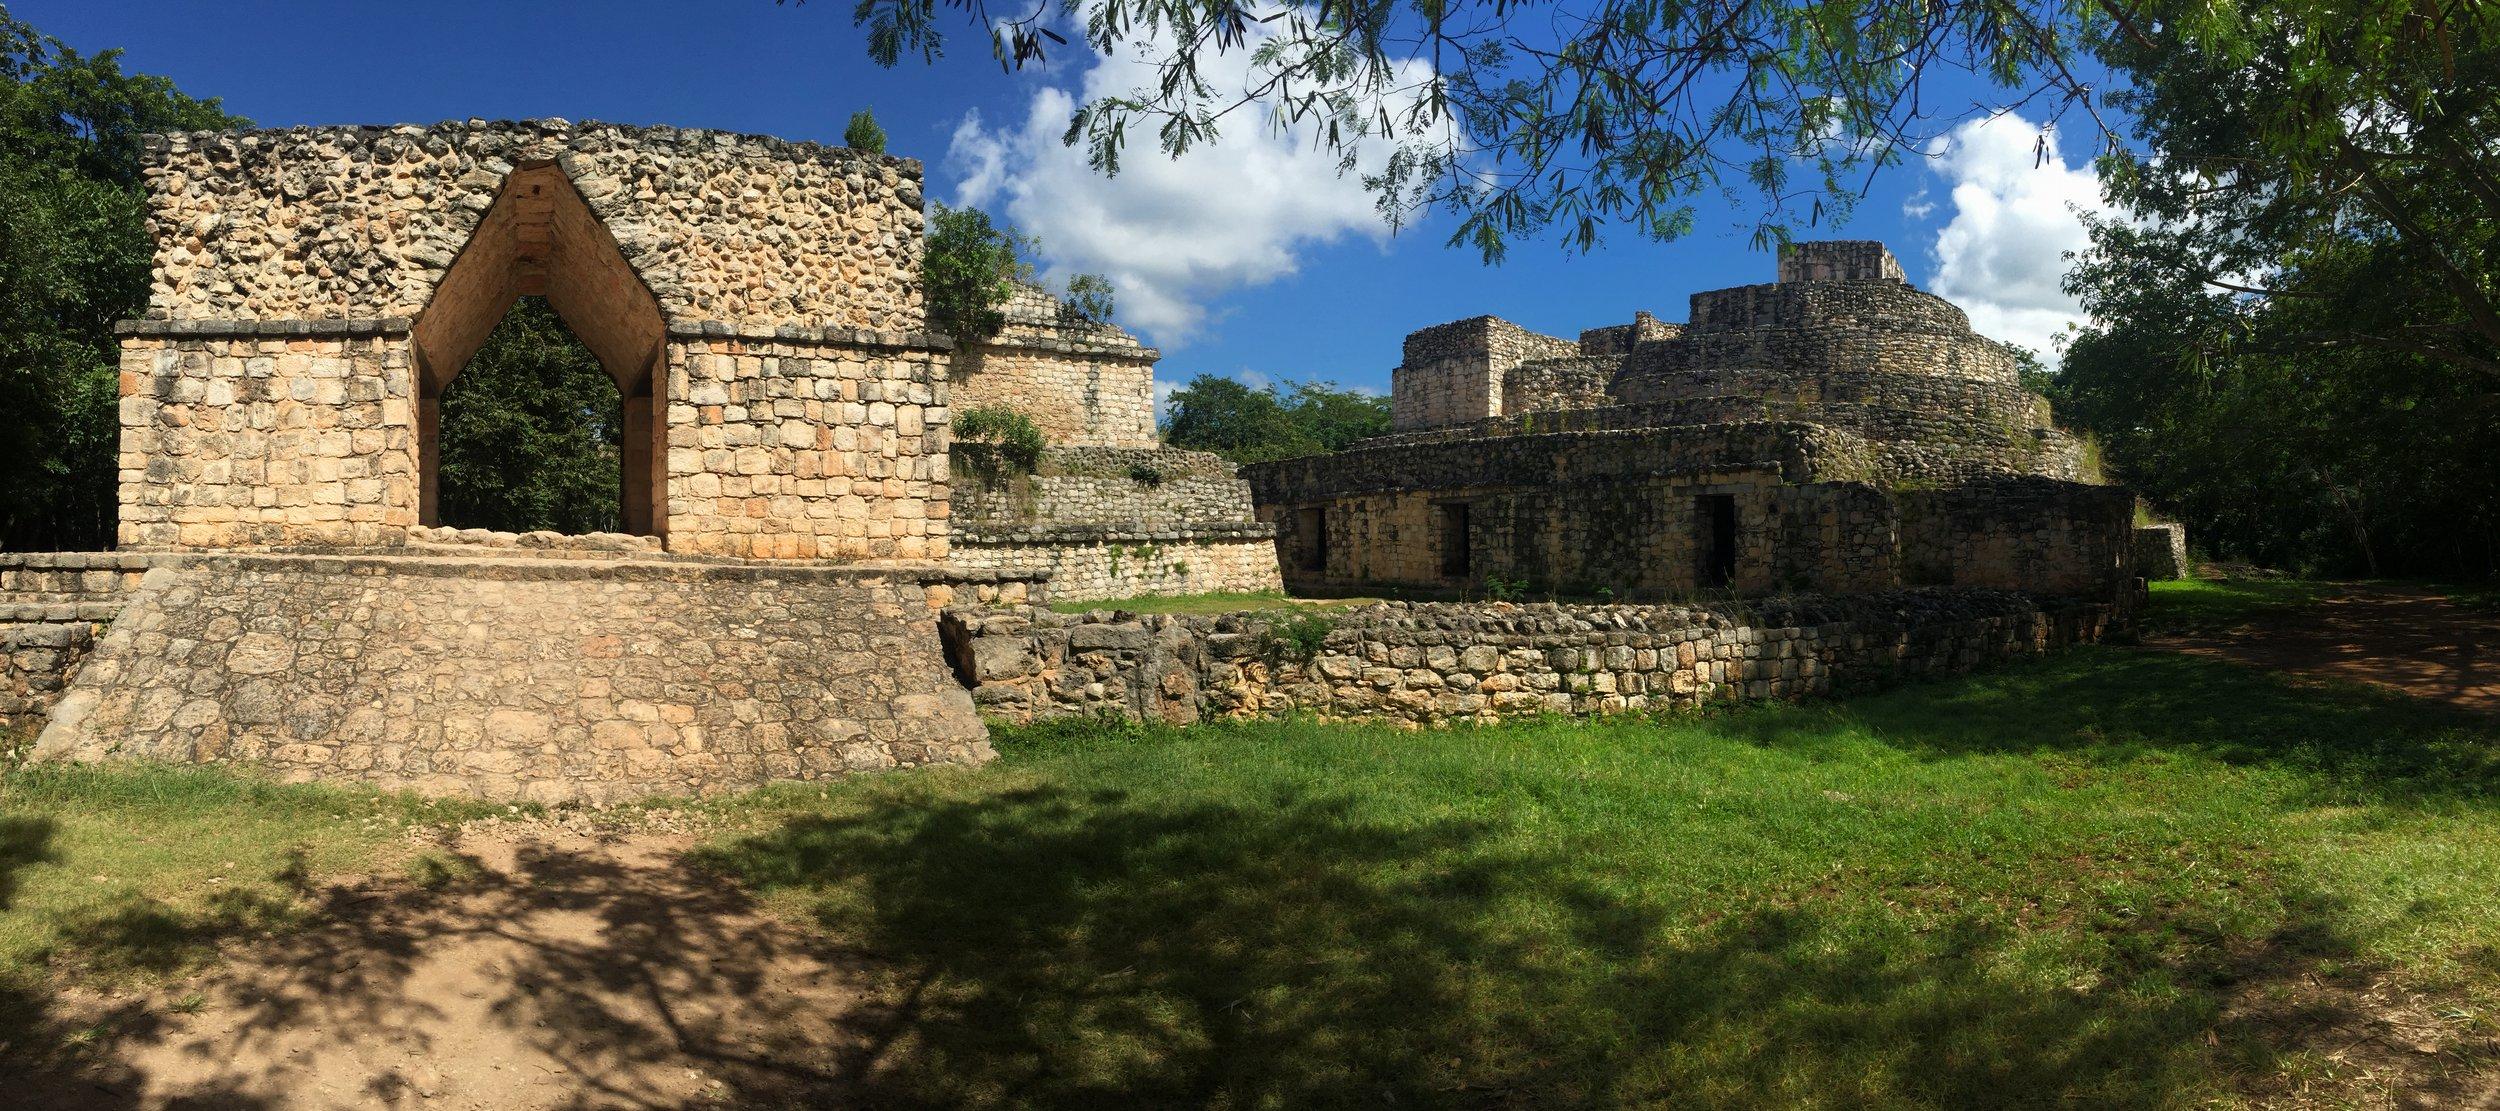 This first group of ruins we came upon at Ek'Balam